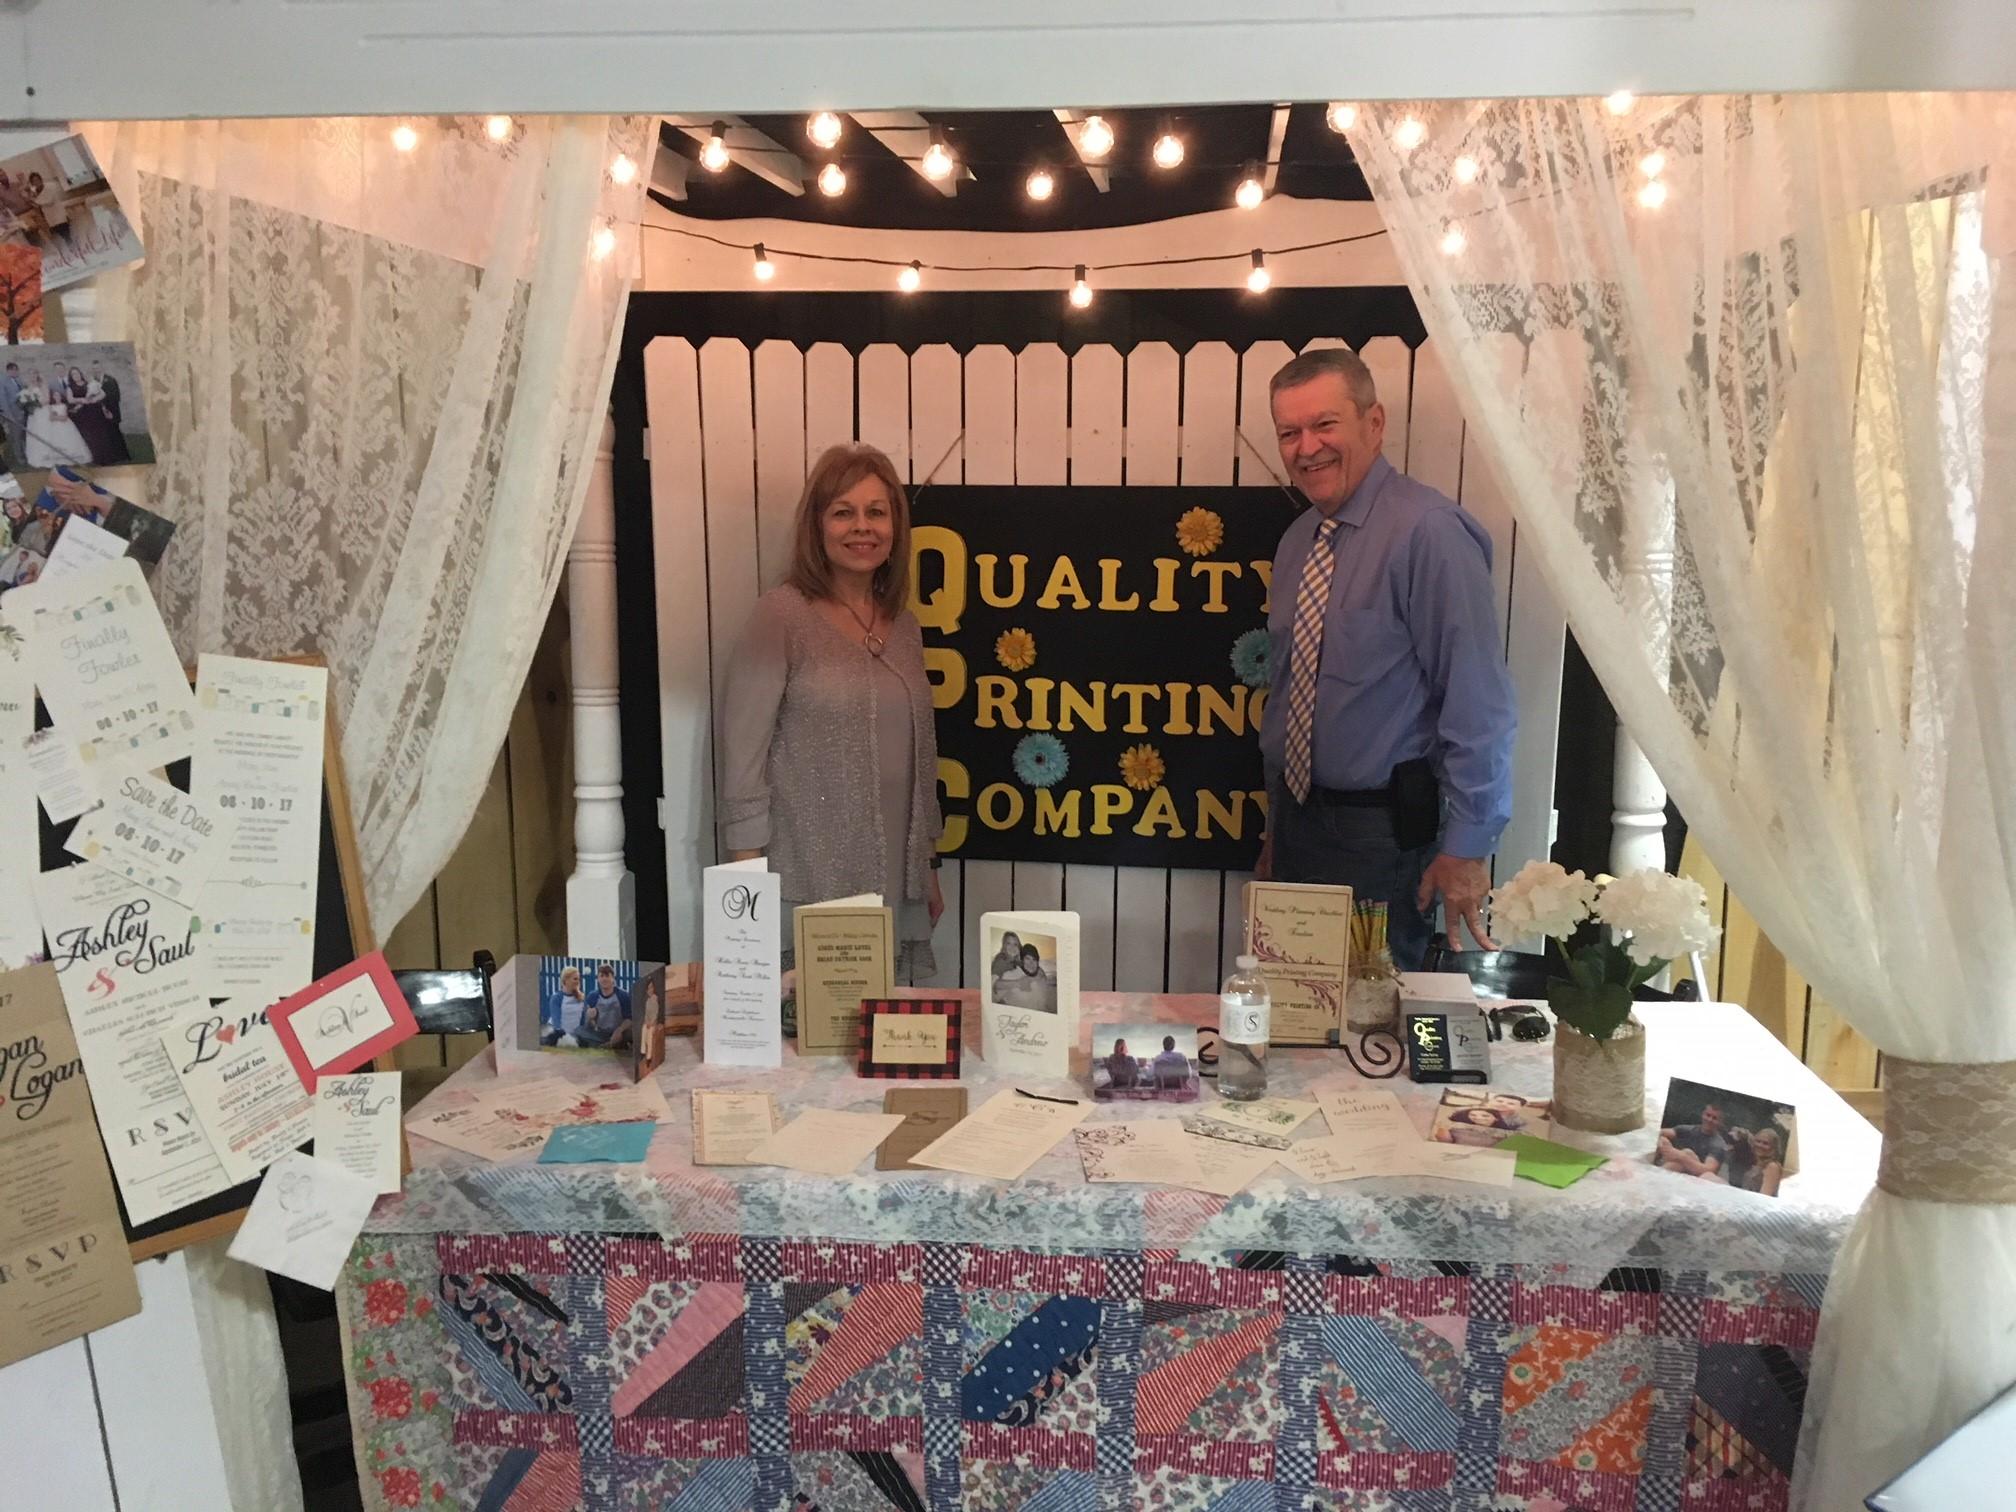 Quality Printing Company image 0